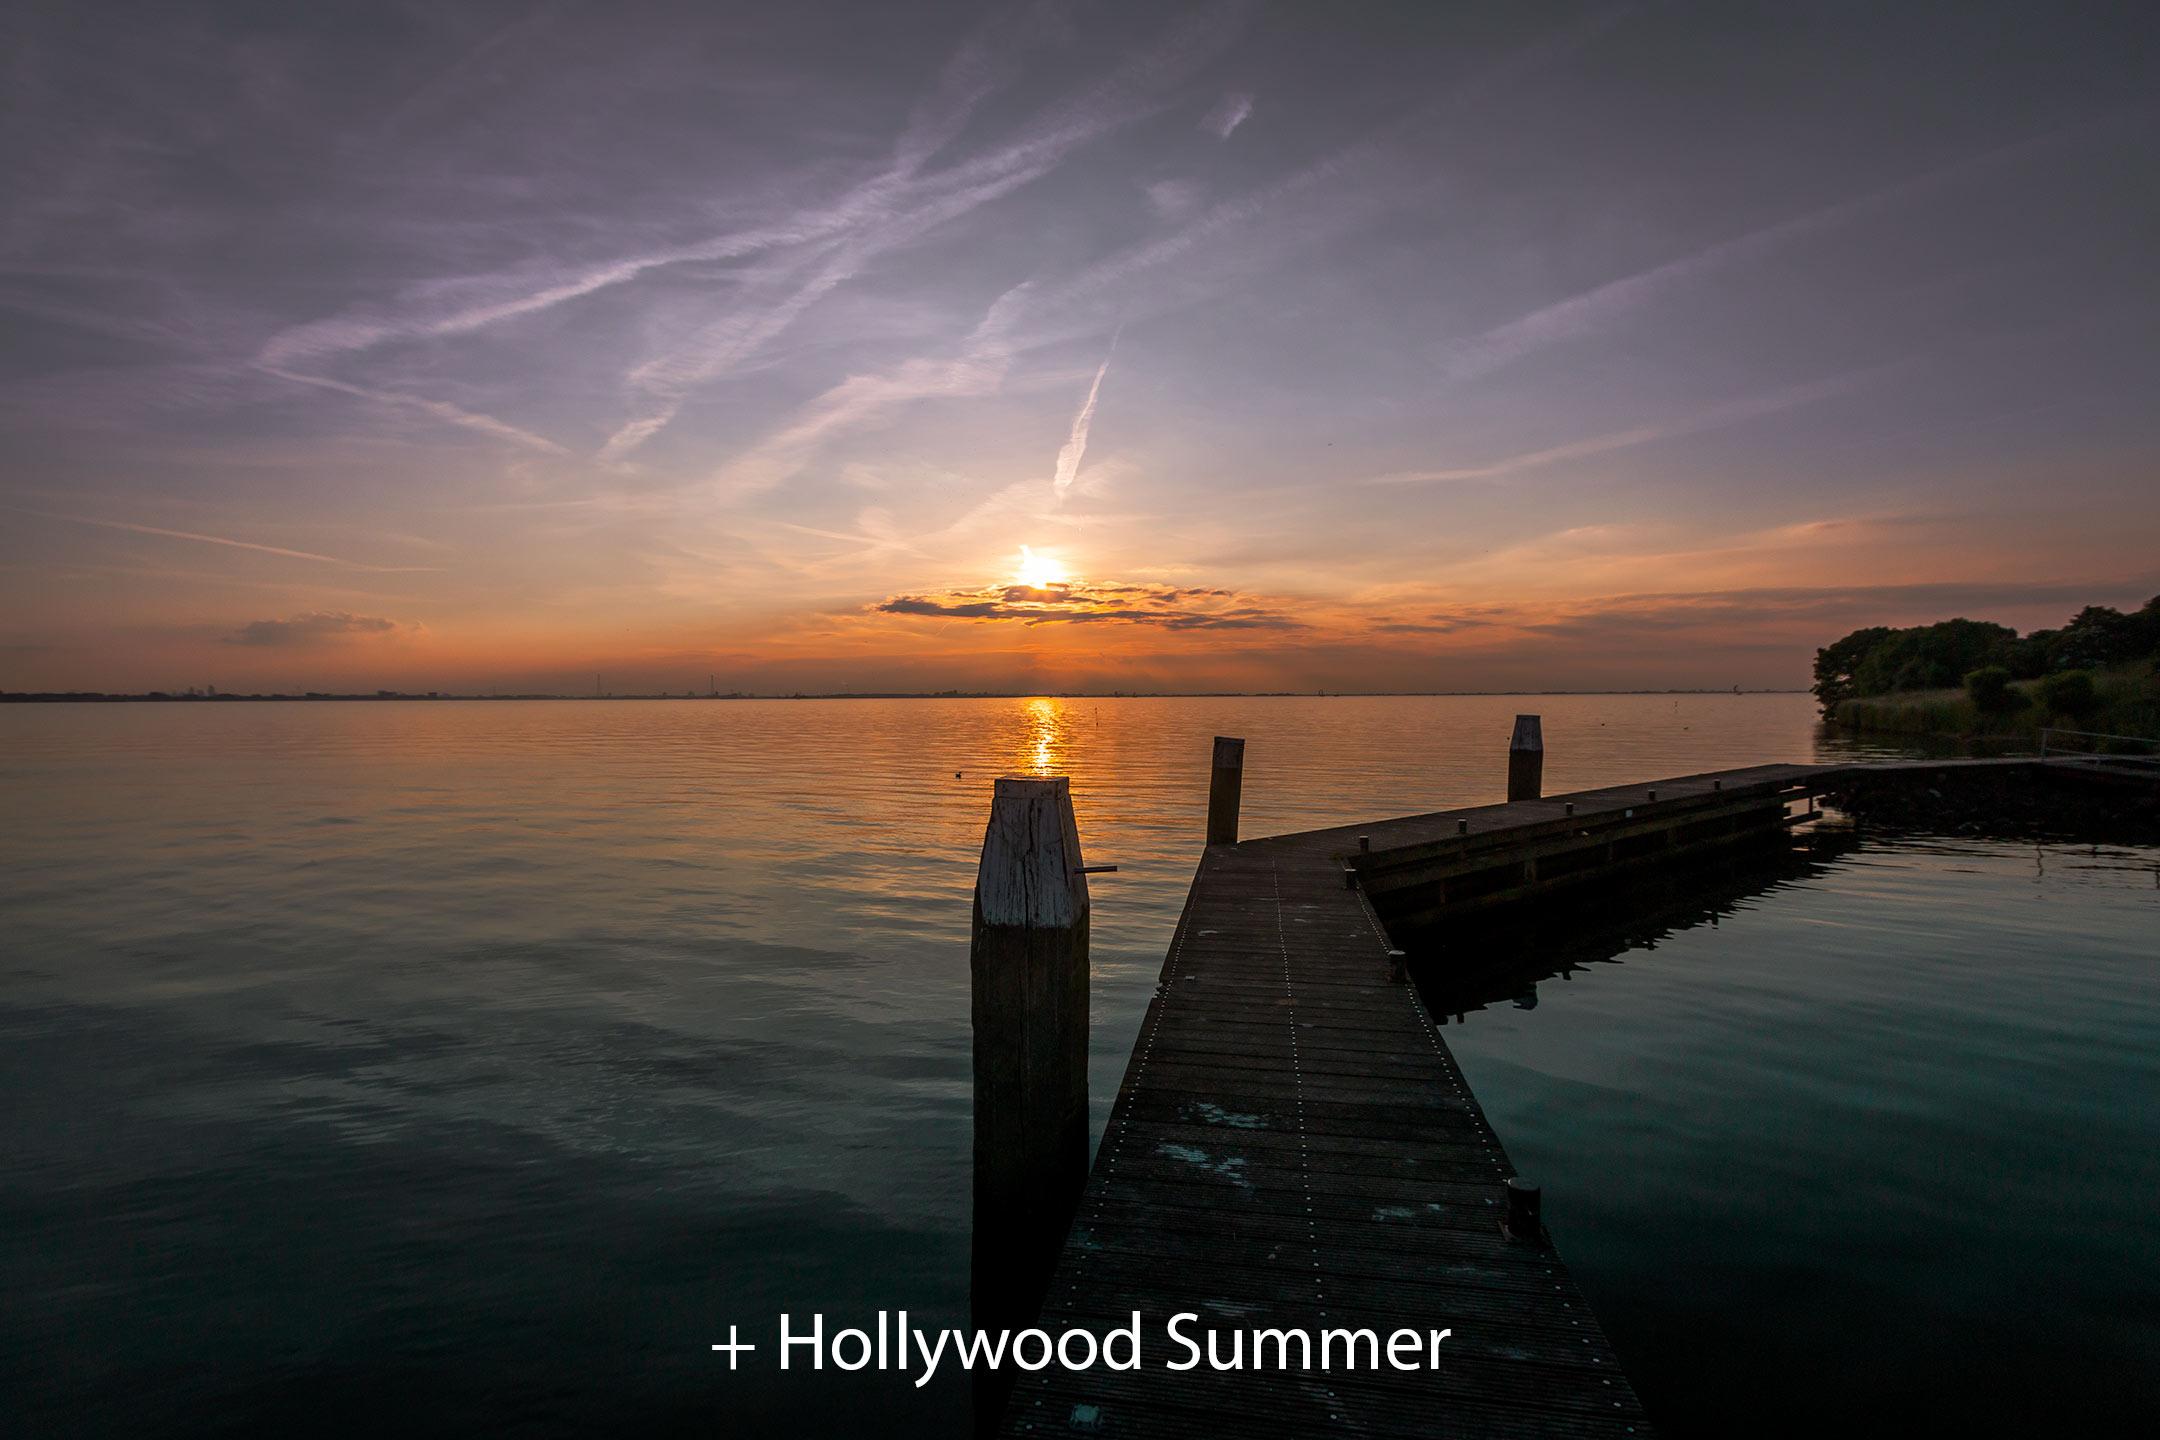 Hollywood Summer 2.jpg